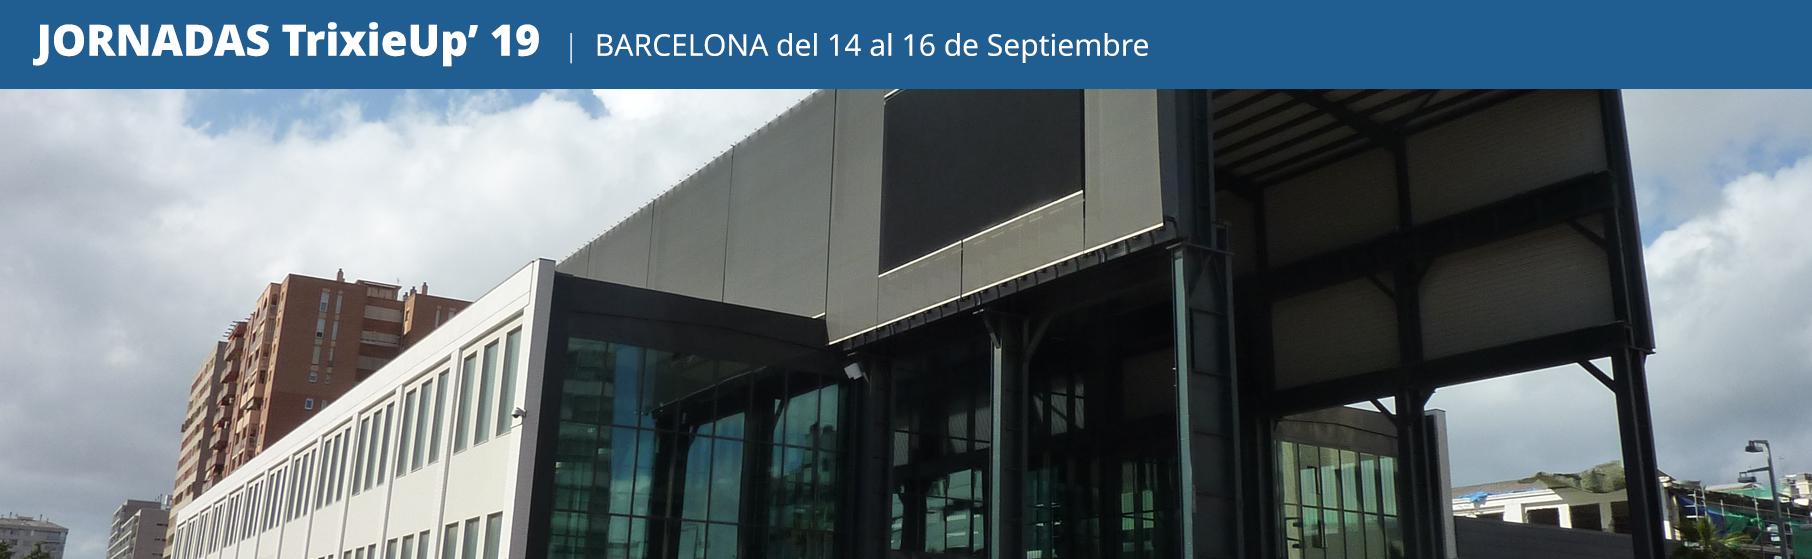 Barcelona-Fira-Sabadell-2019